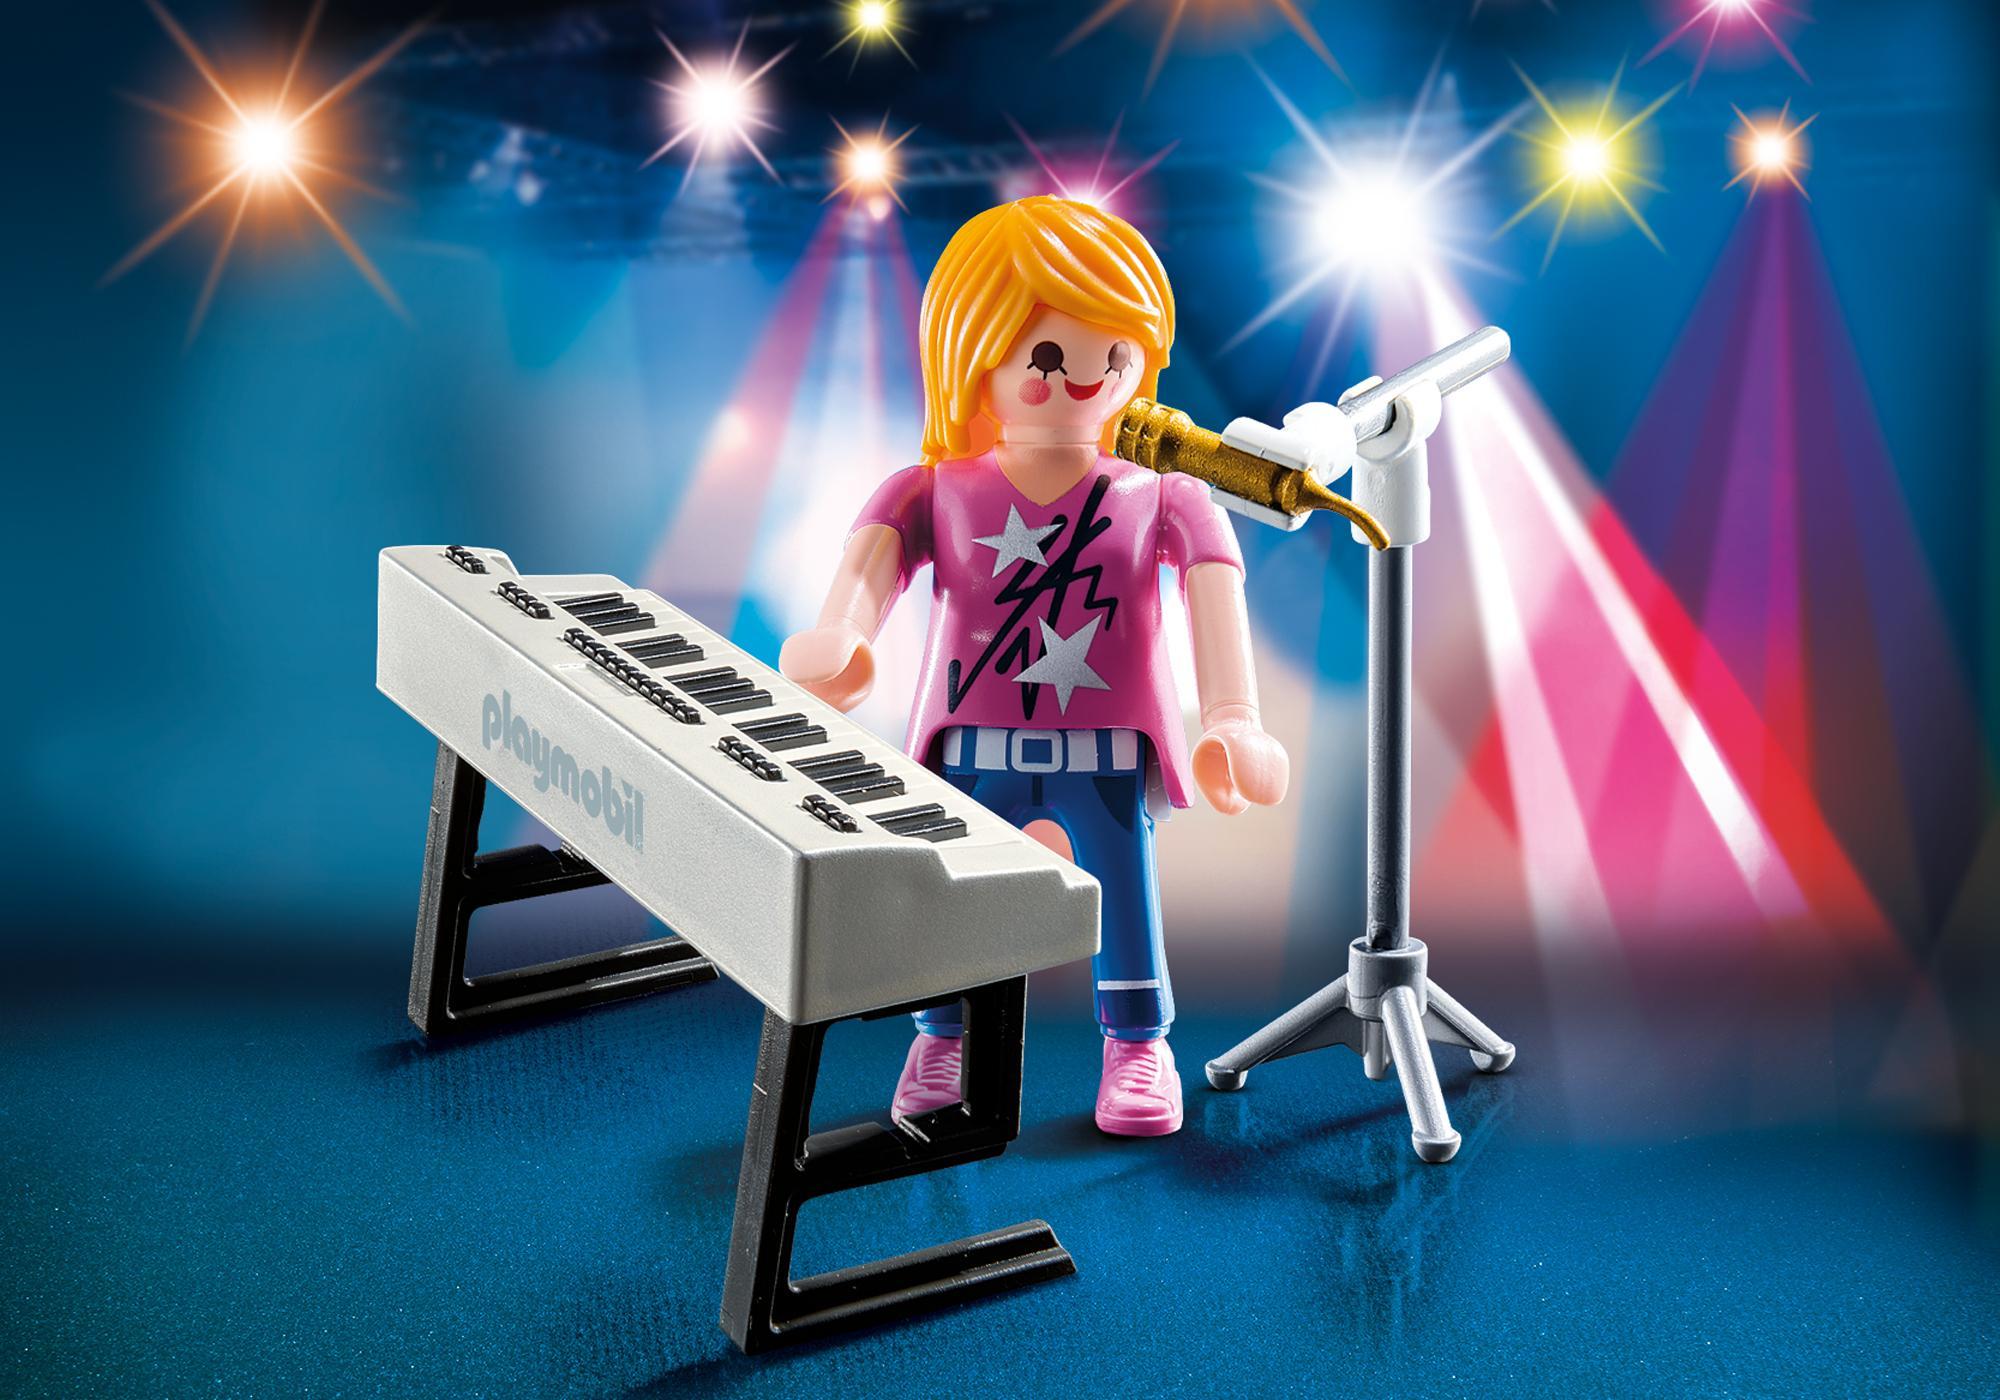 http://media.playmobil.com/i/playmobil/9095_product_detail/Sängerin am Keyboard